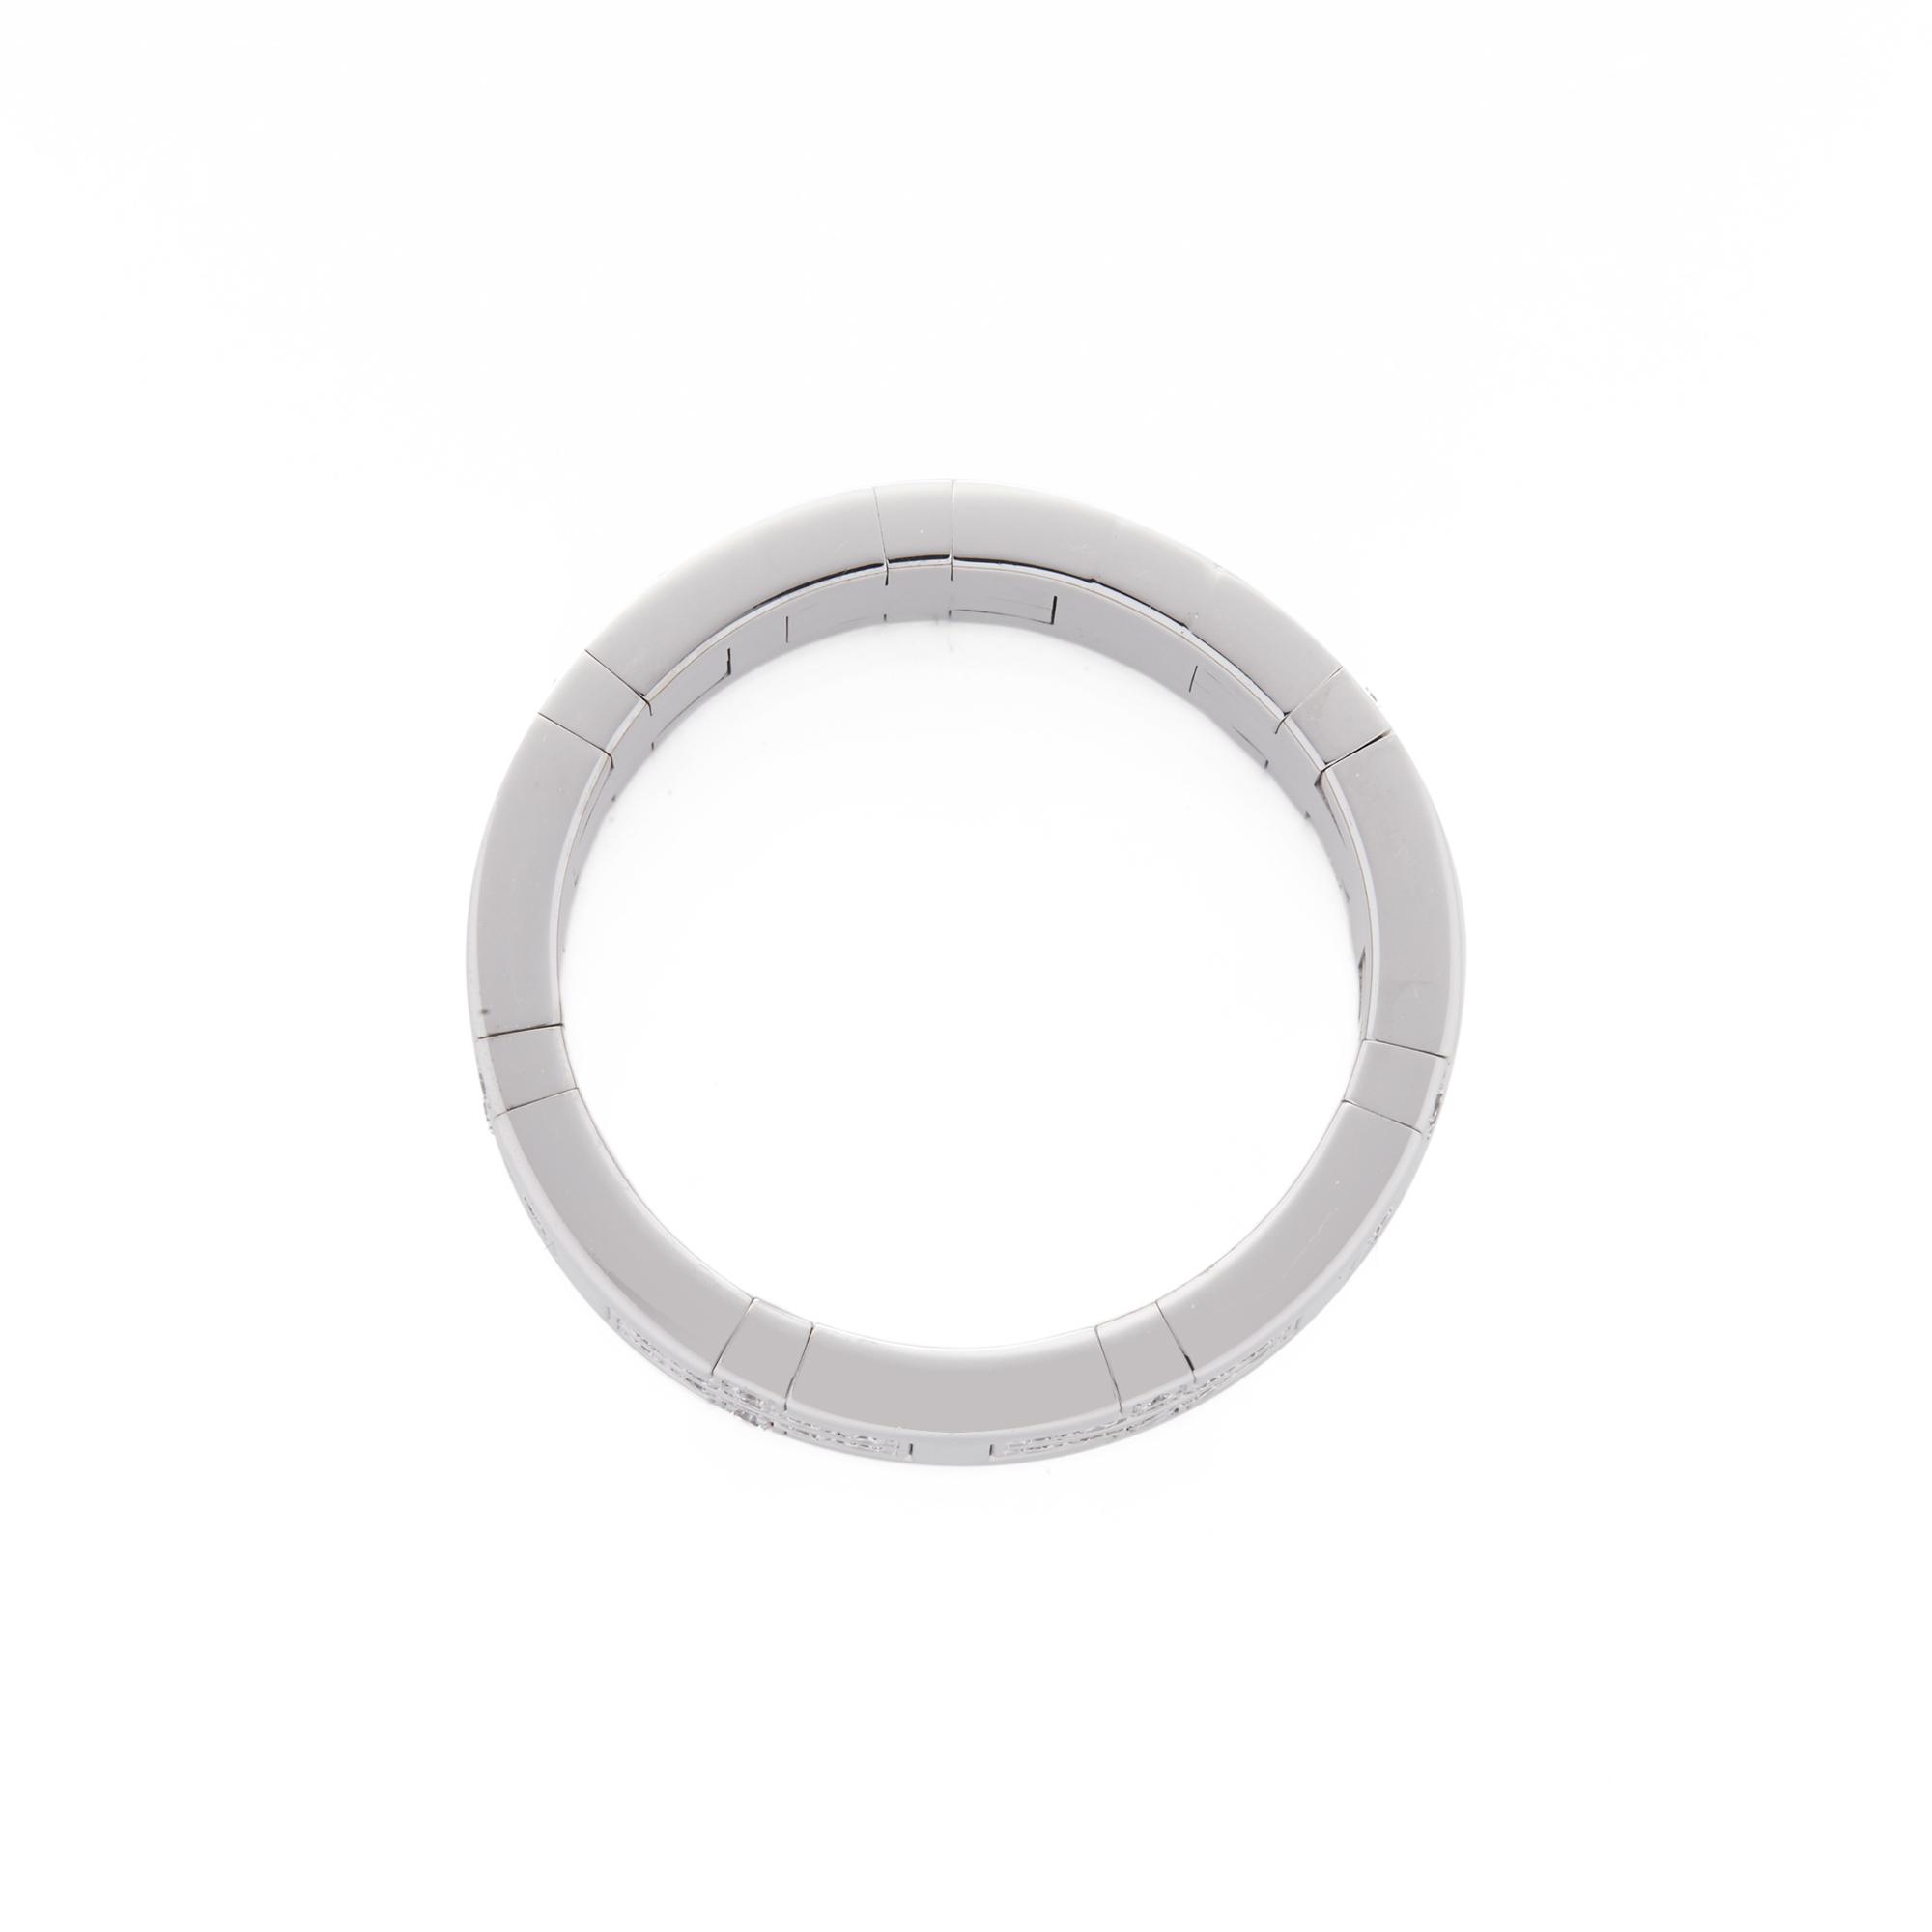 Hermes 18ct White Gold Kilim Diamond Ring - Image 3 of 8